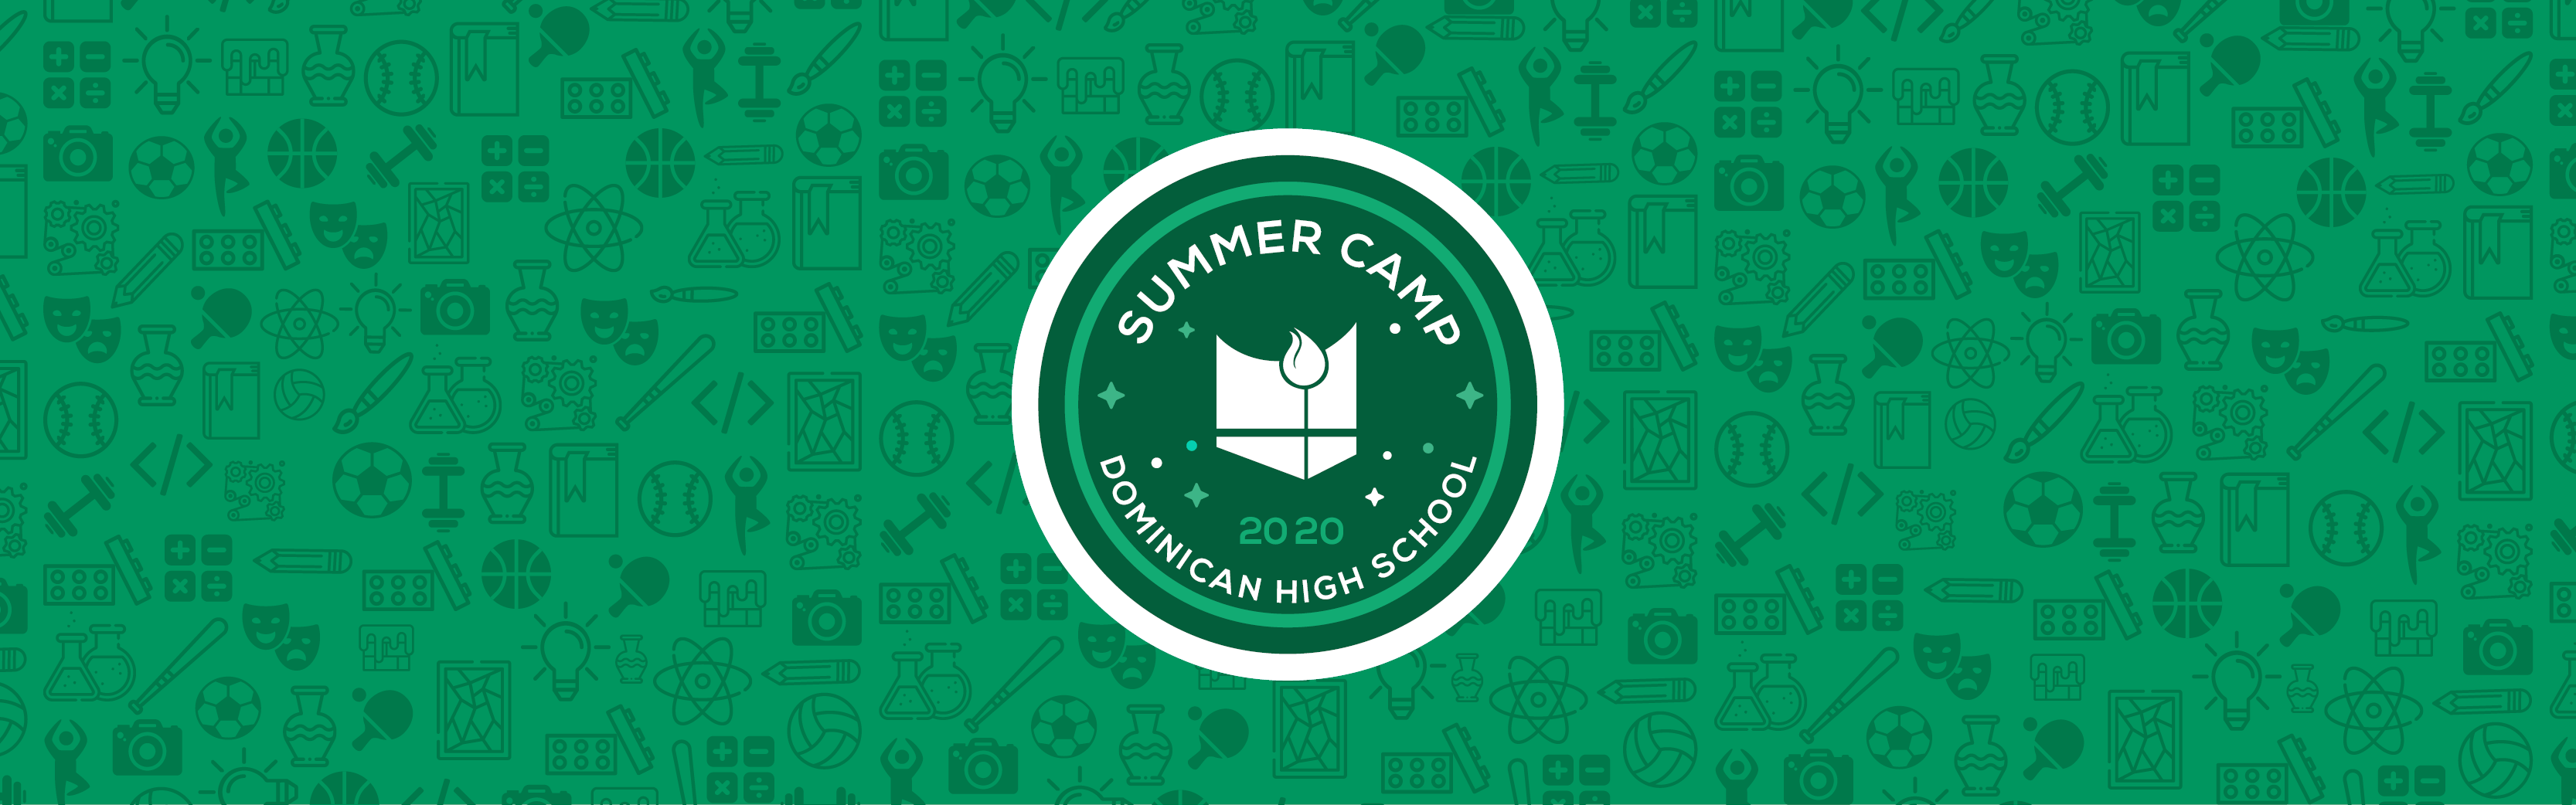 website-banner-summer-camp-2020